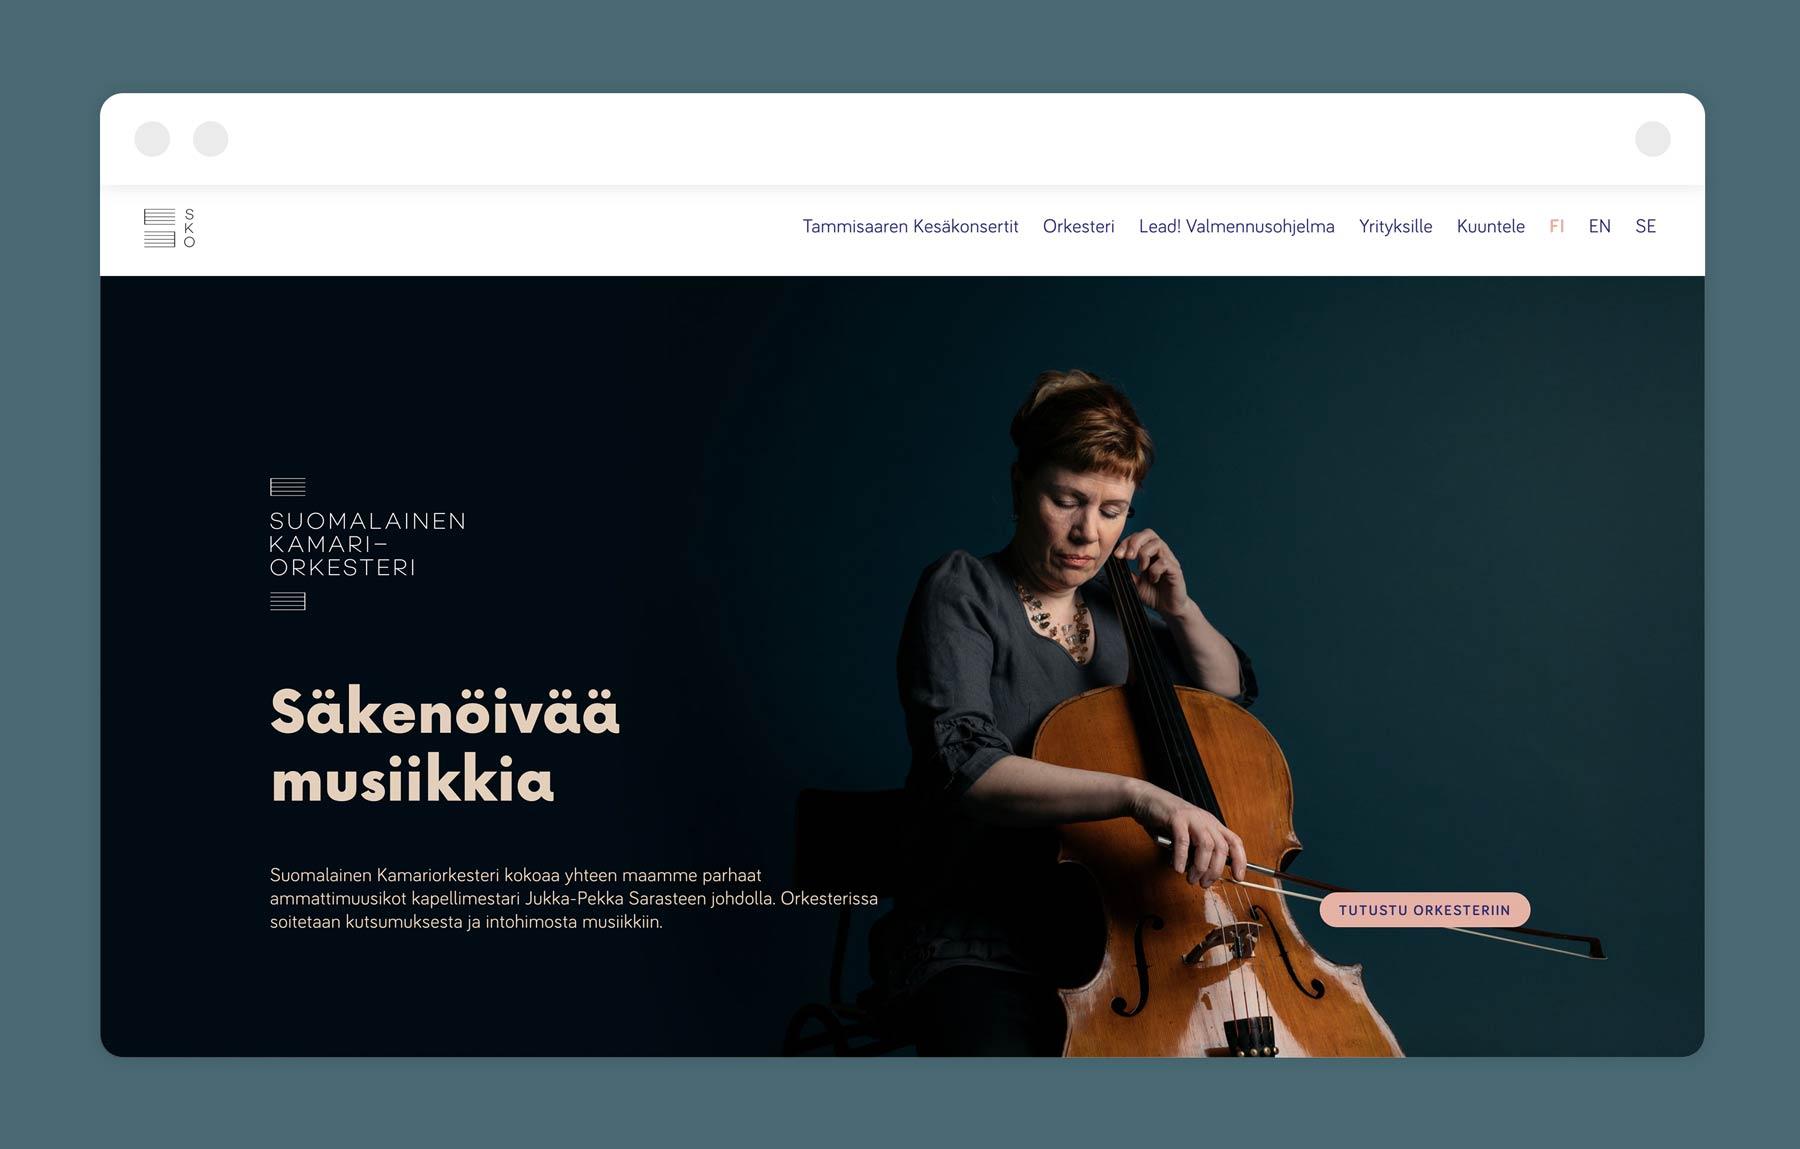 Suomalainen Kamariorkesteri identity and website, design by Kilda